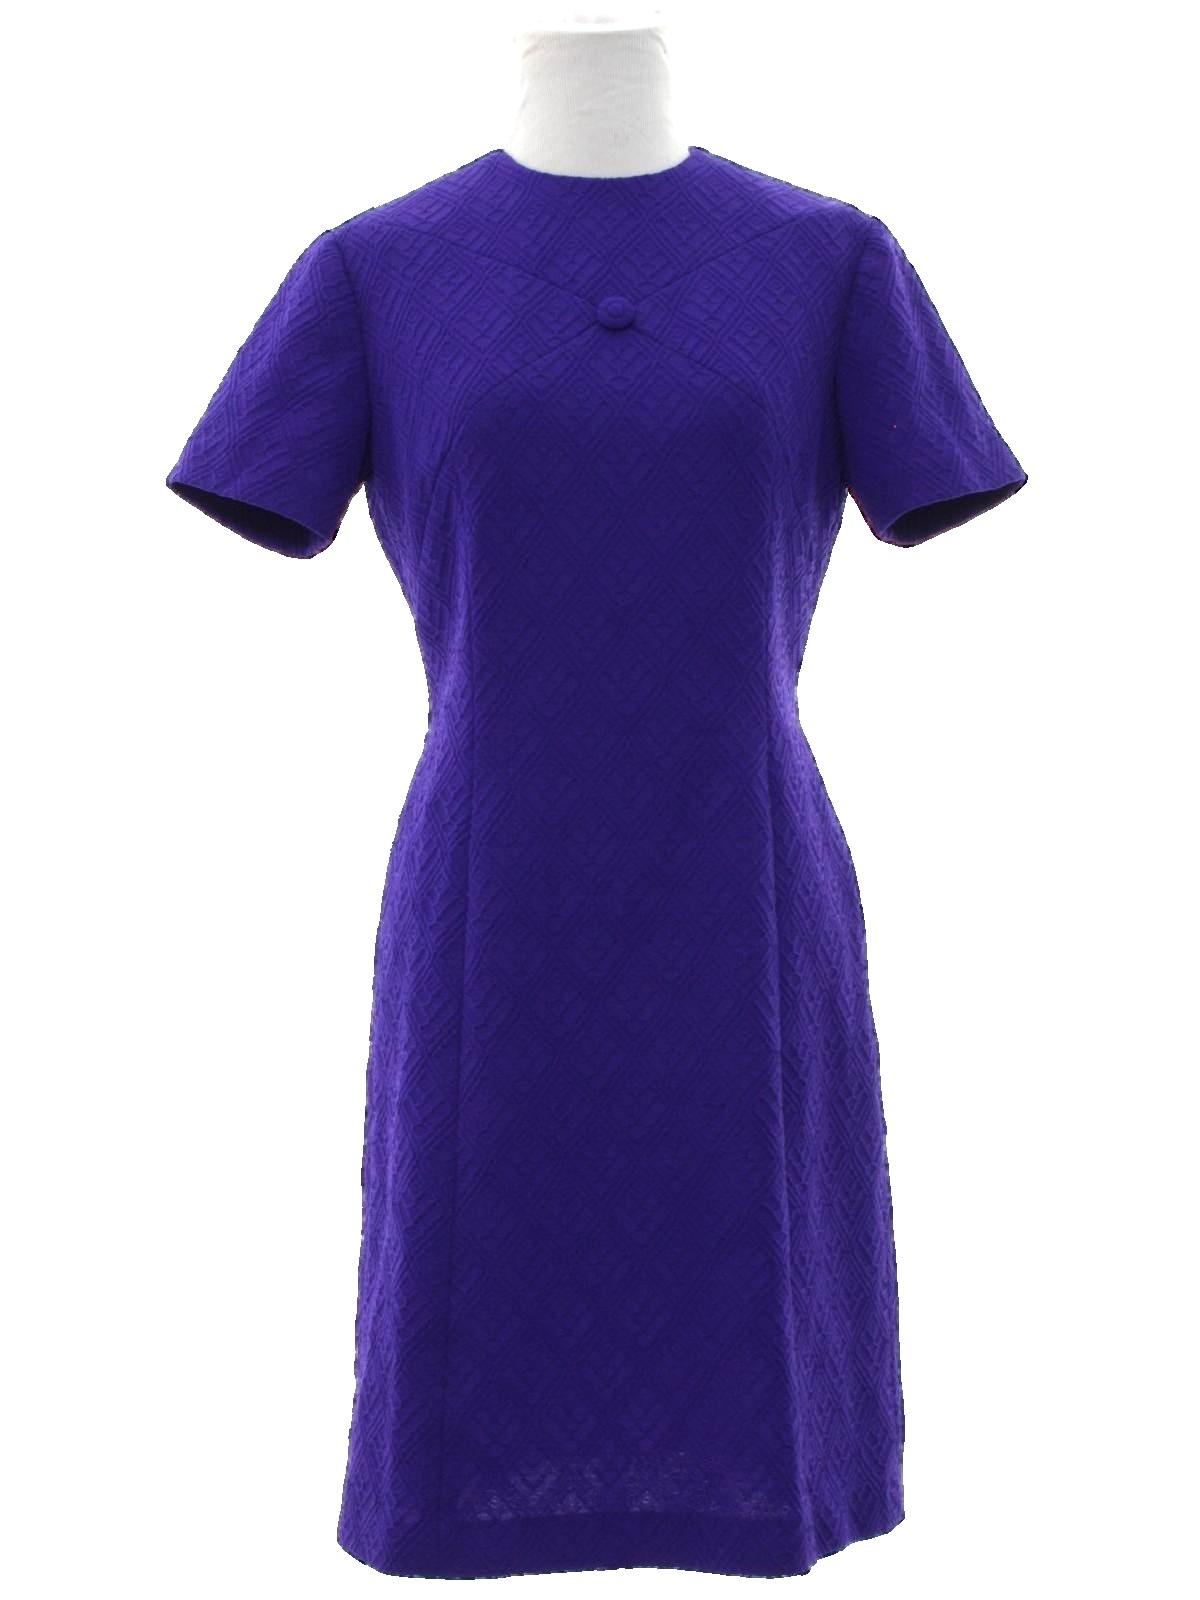 1960\'s Dress (Home Sewn): 60s -Home Sewn- Womens purple raised ...